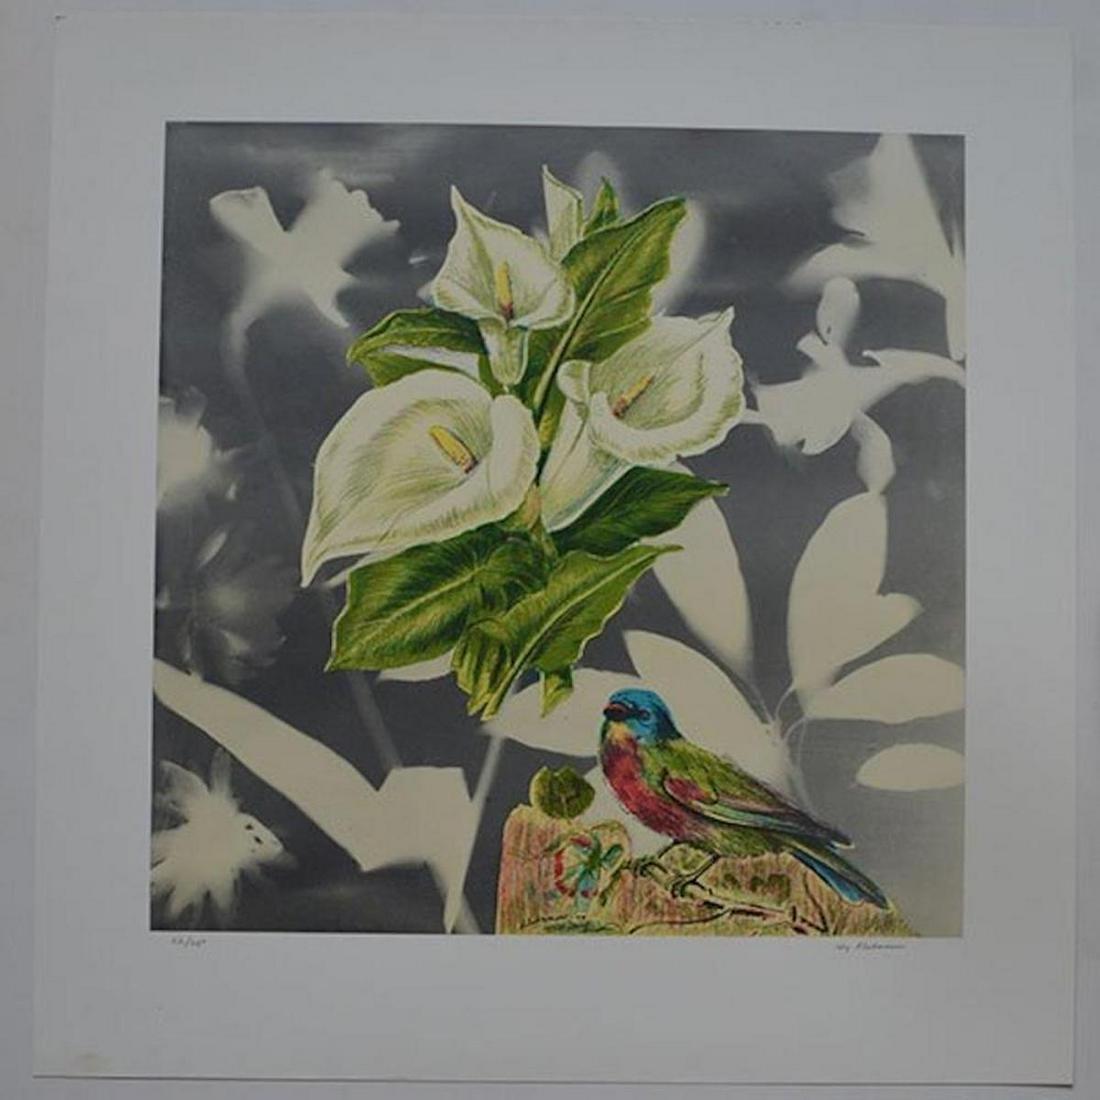 BIRD WITH CALLA LILIES